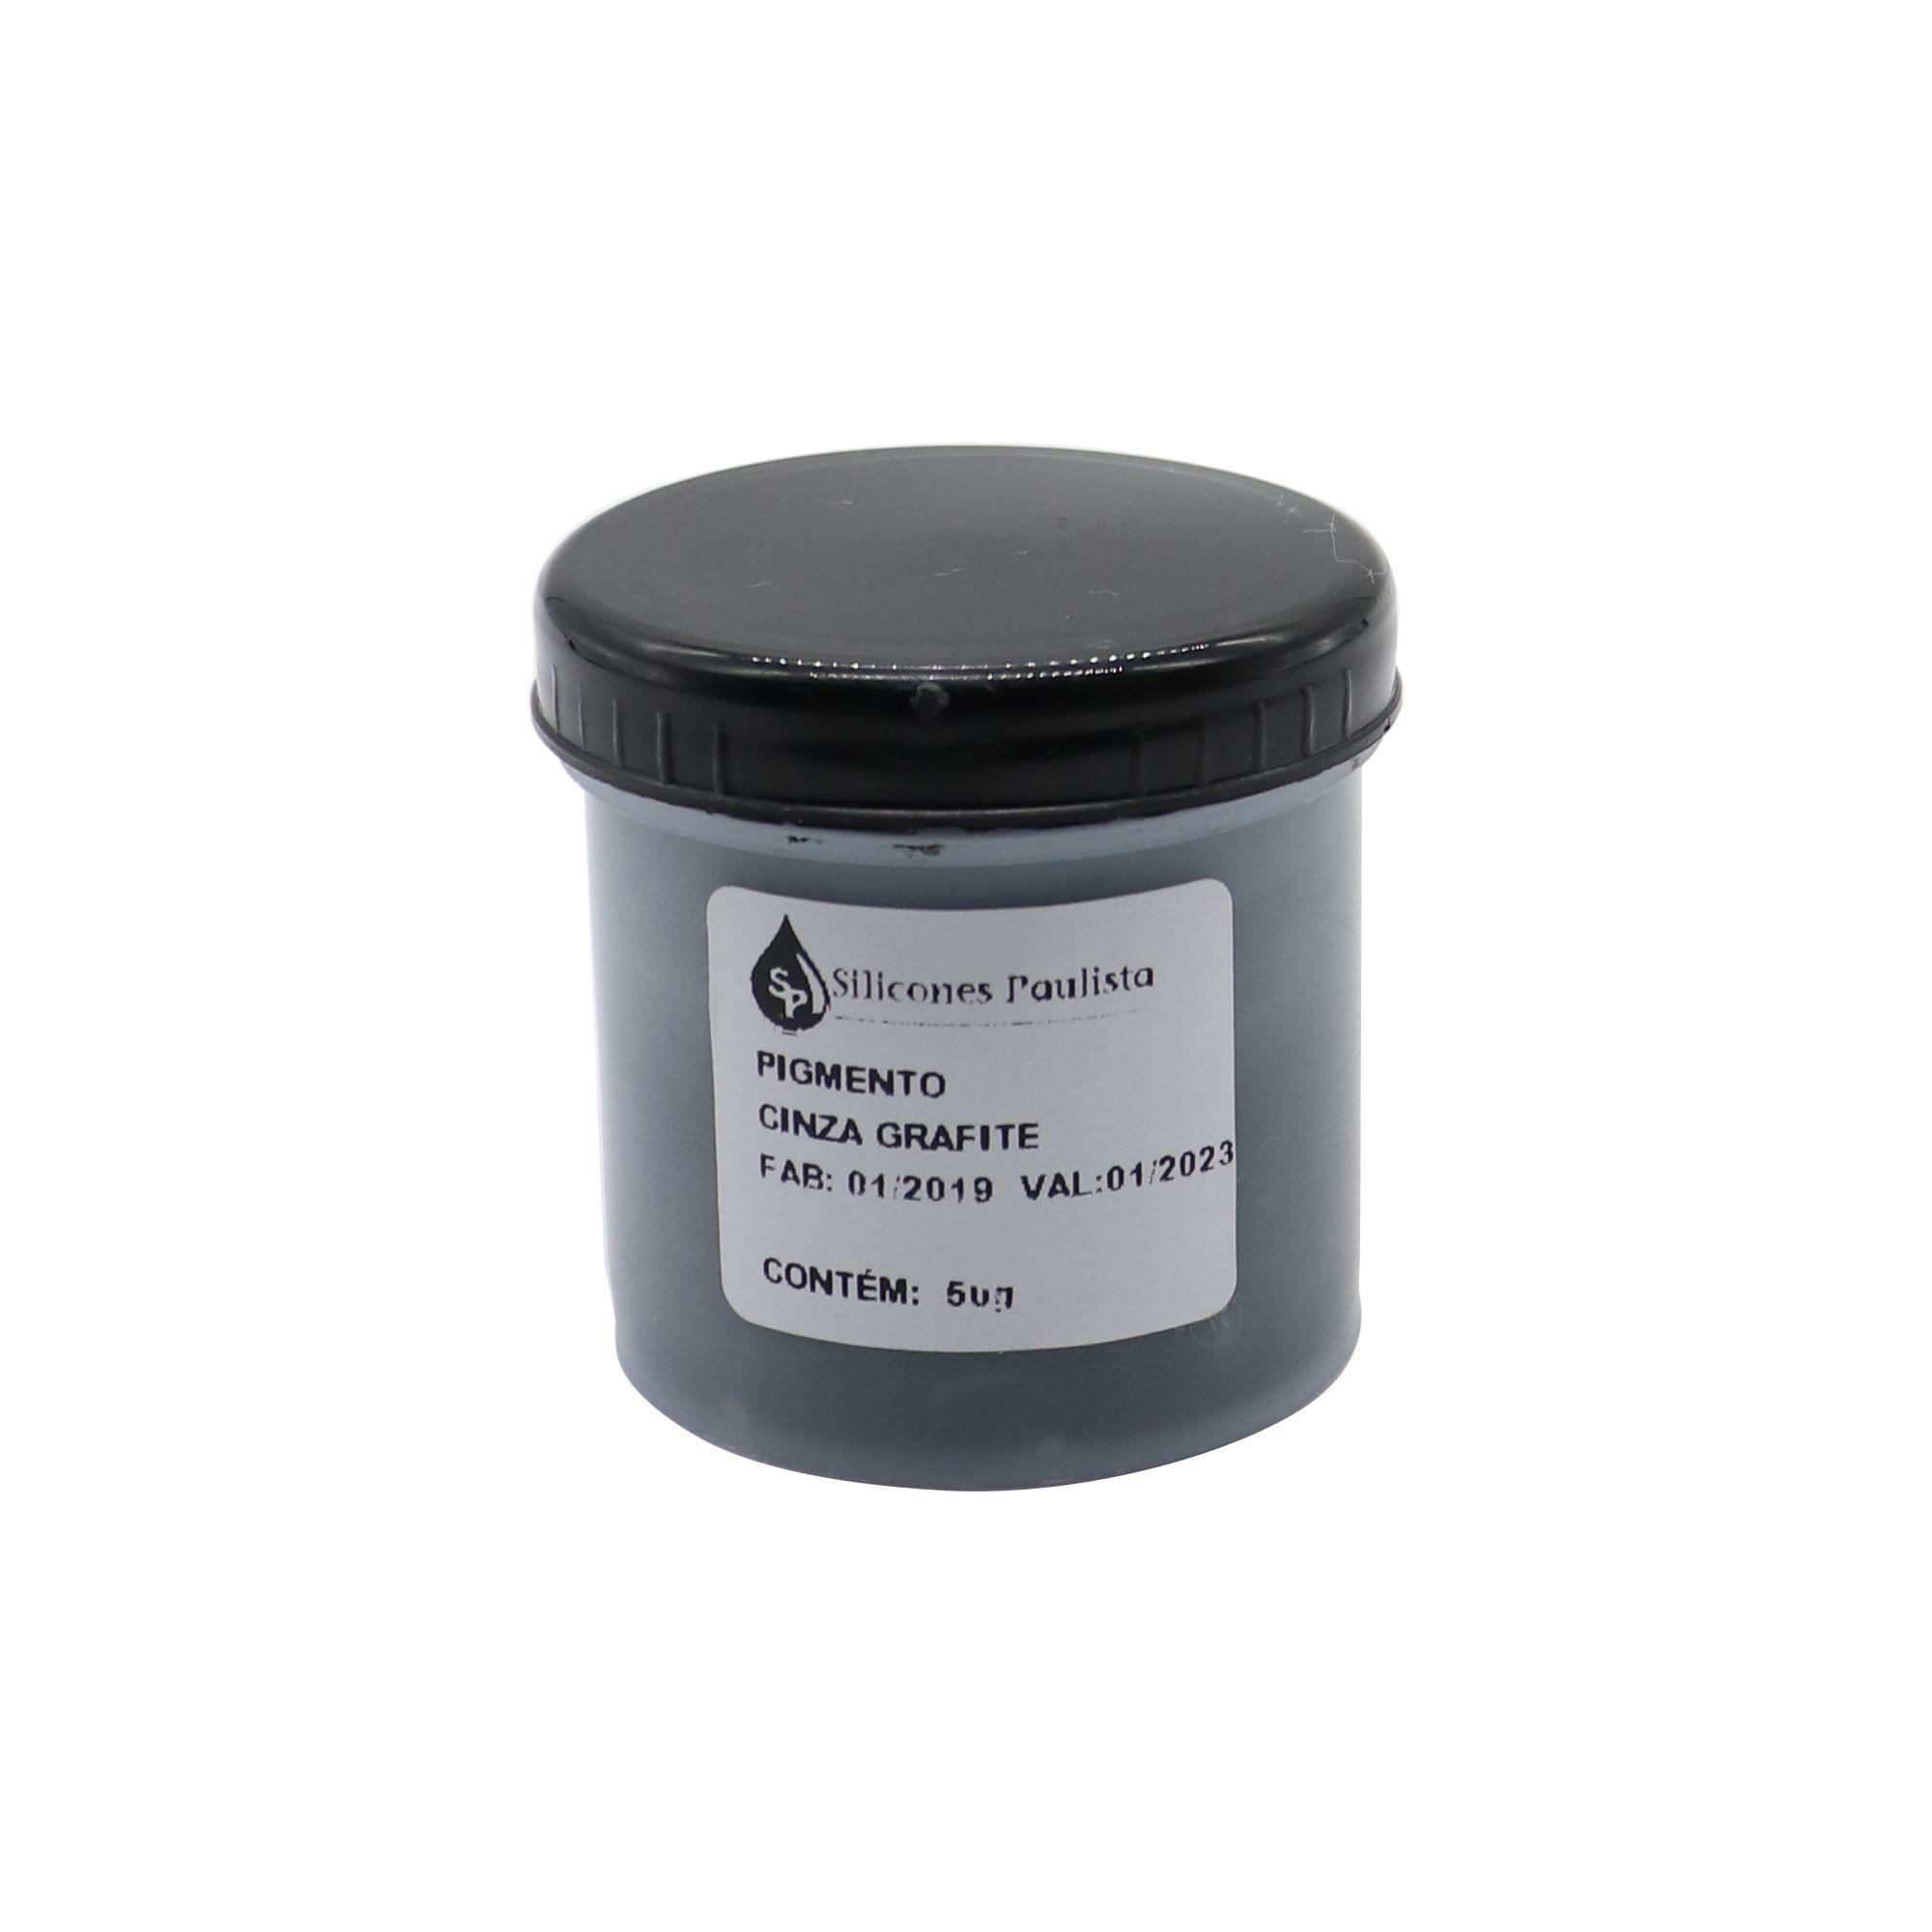 Pigmento pra Resina e Borracha 50g - Cinza grafite